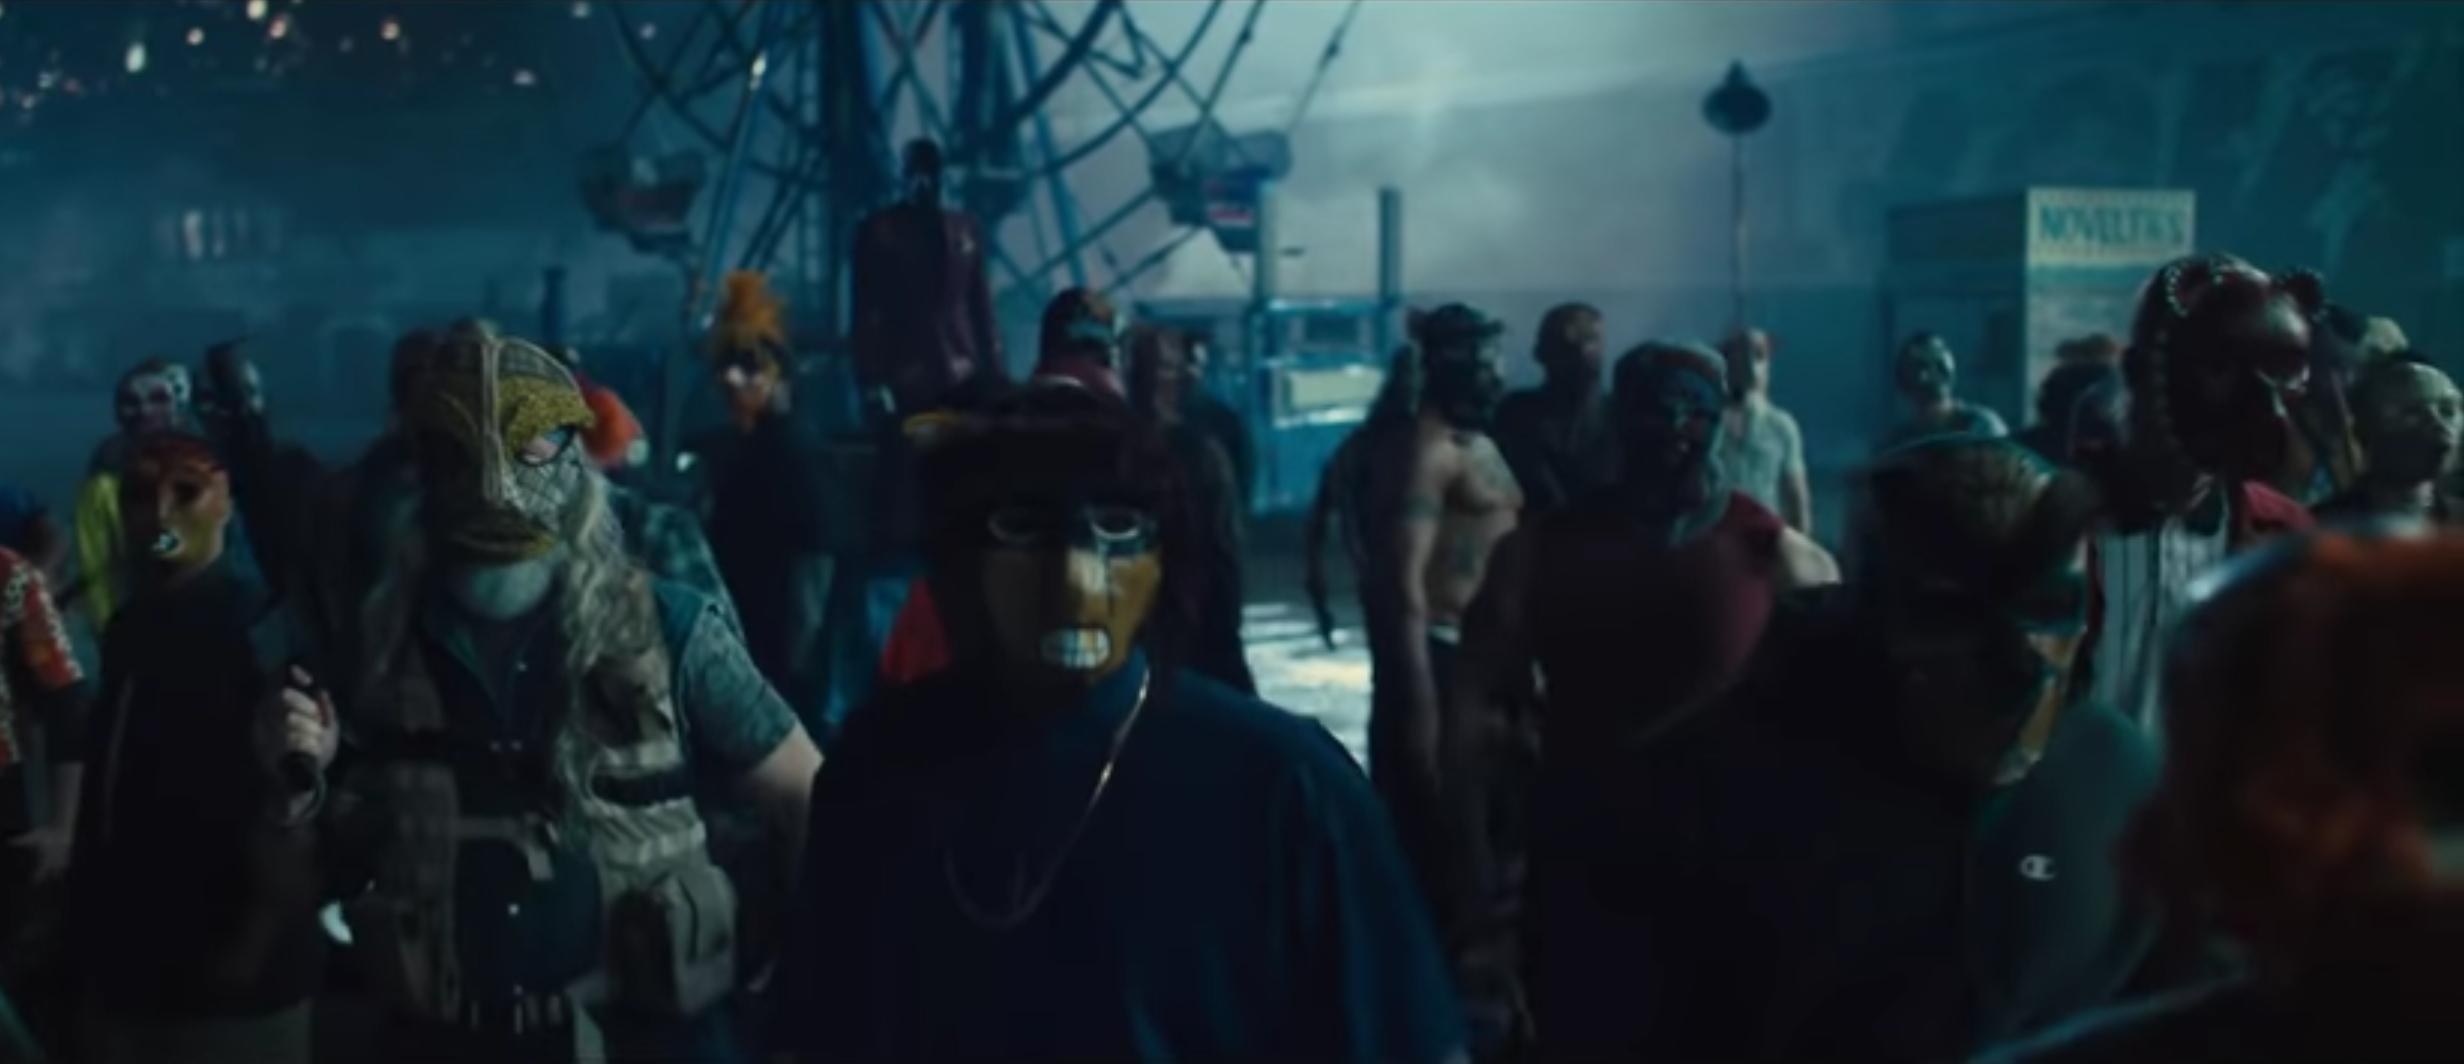 Black Mask's criminal organization